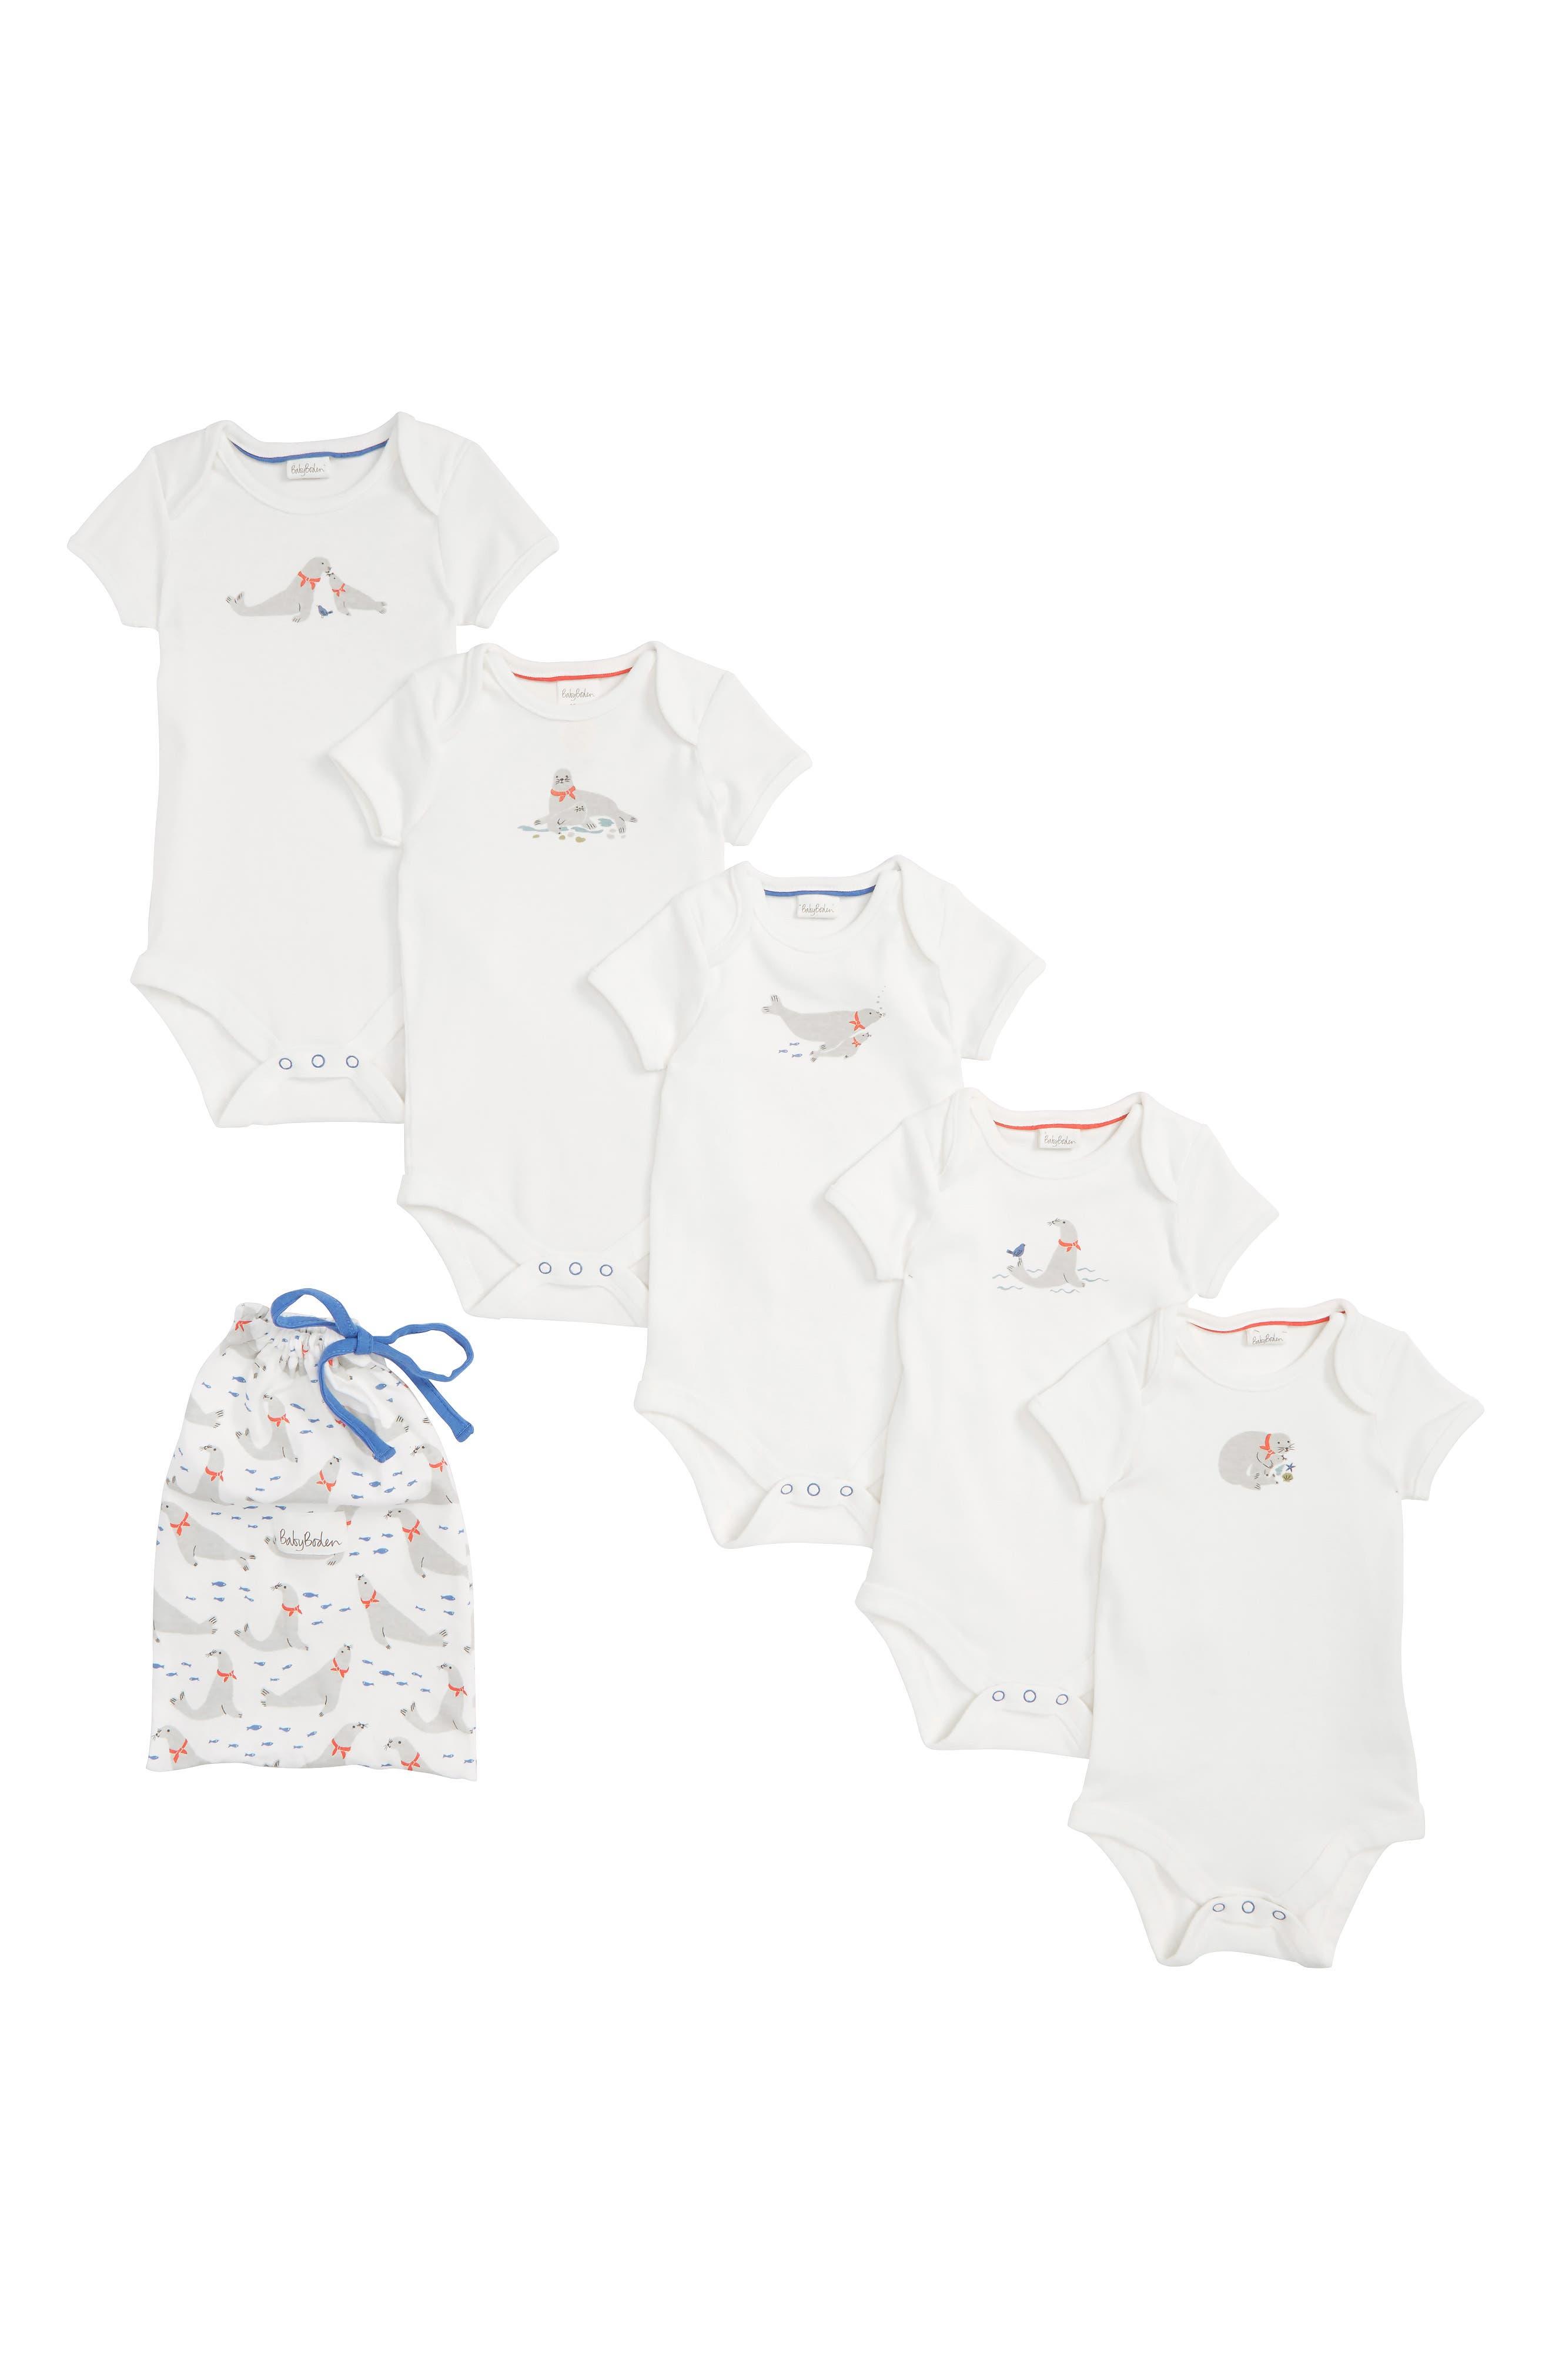 Seals 5-Pack Organic Cotton Bodysuits,                             Main thumbnail 1, color,                             904